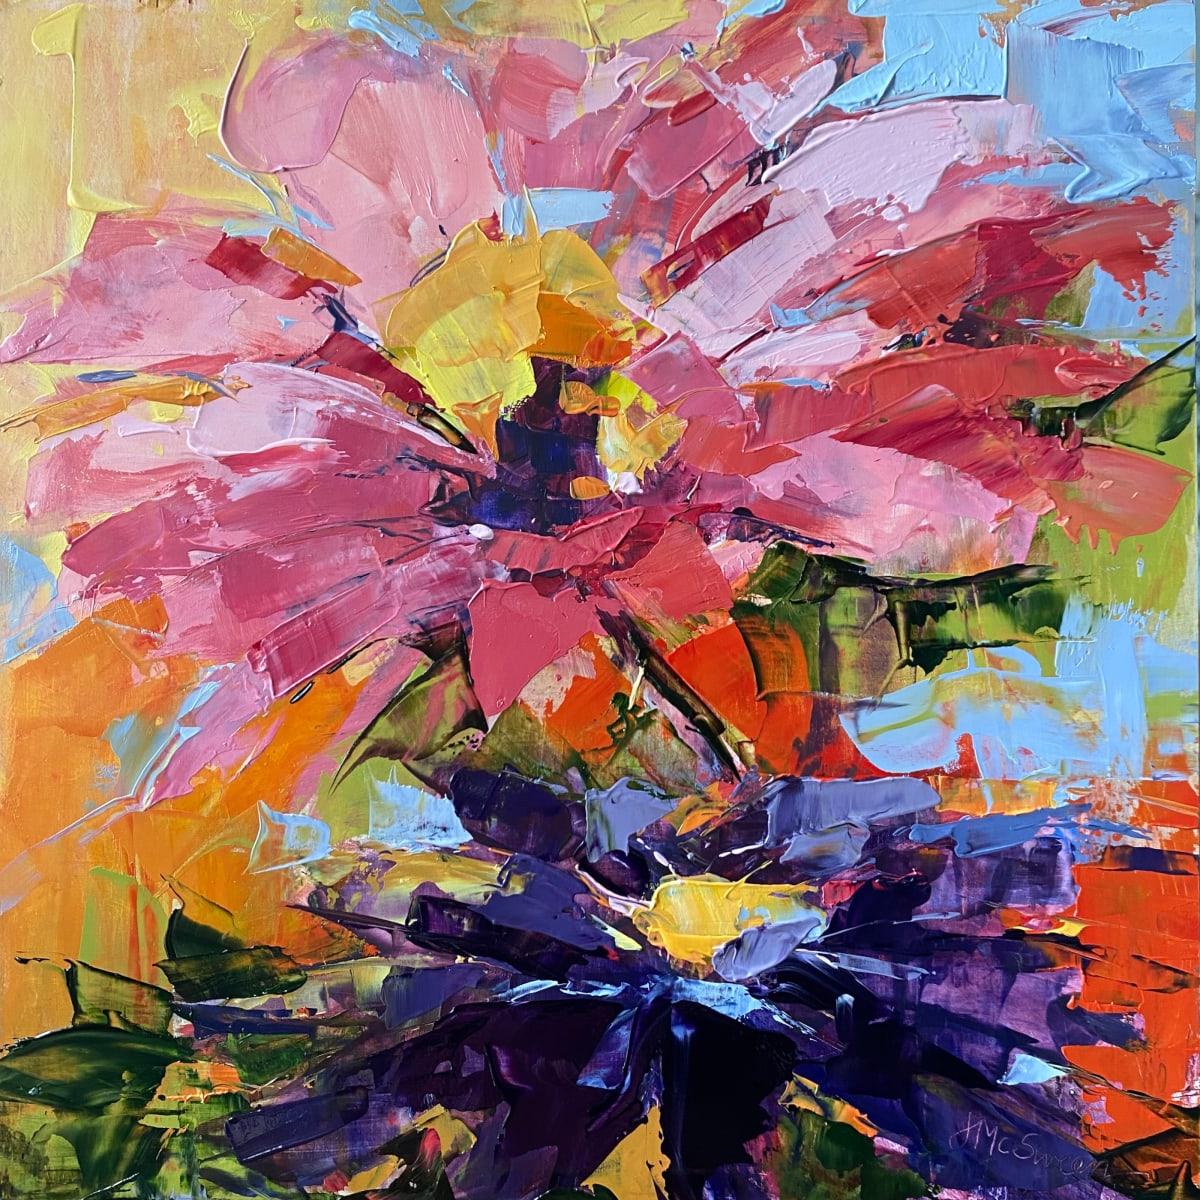 Joyful by Judy McSween